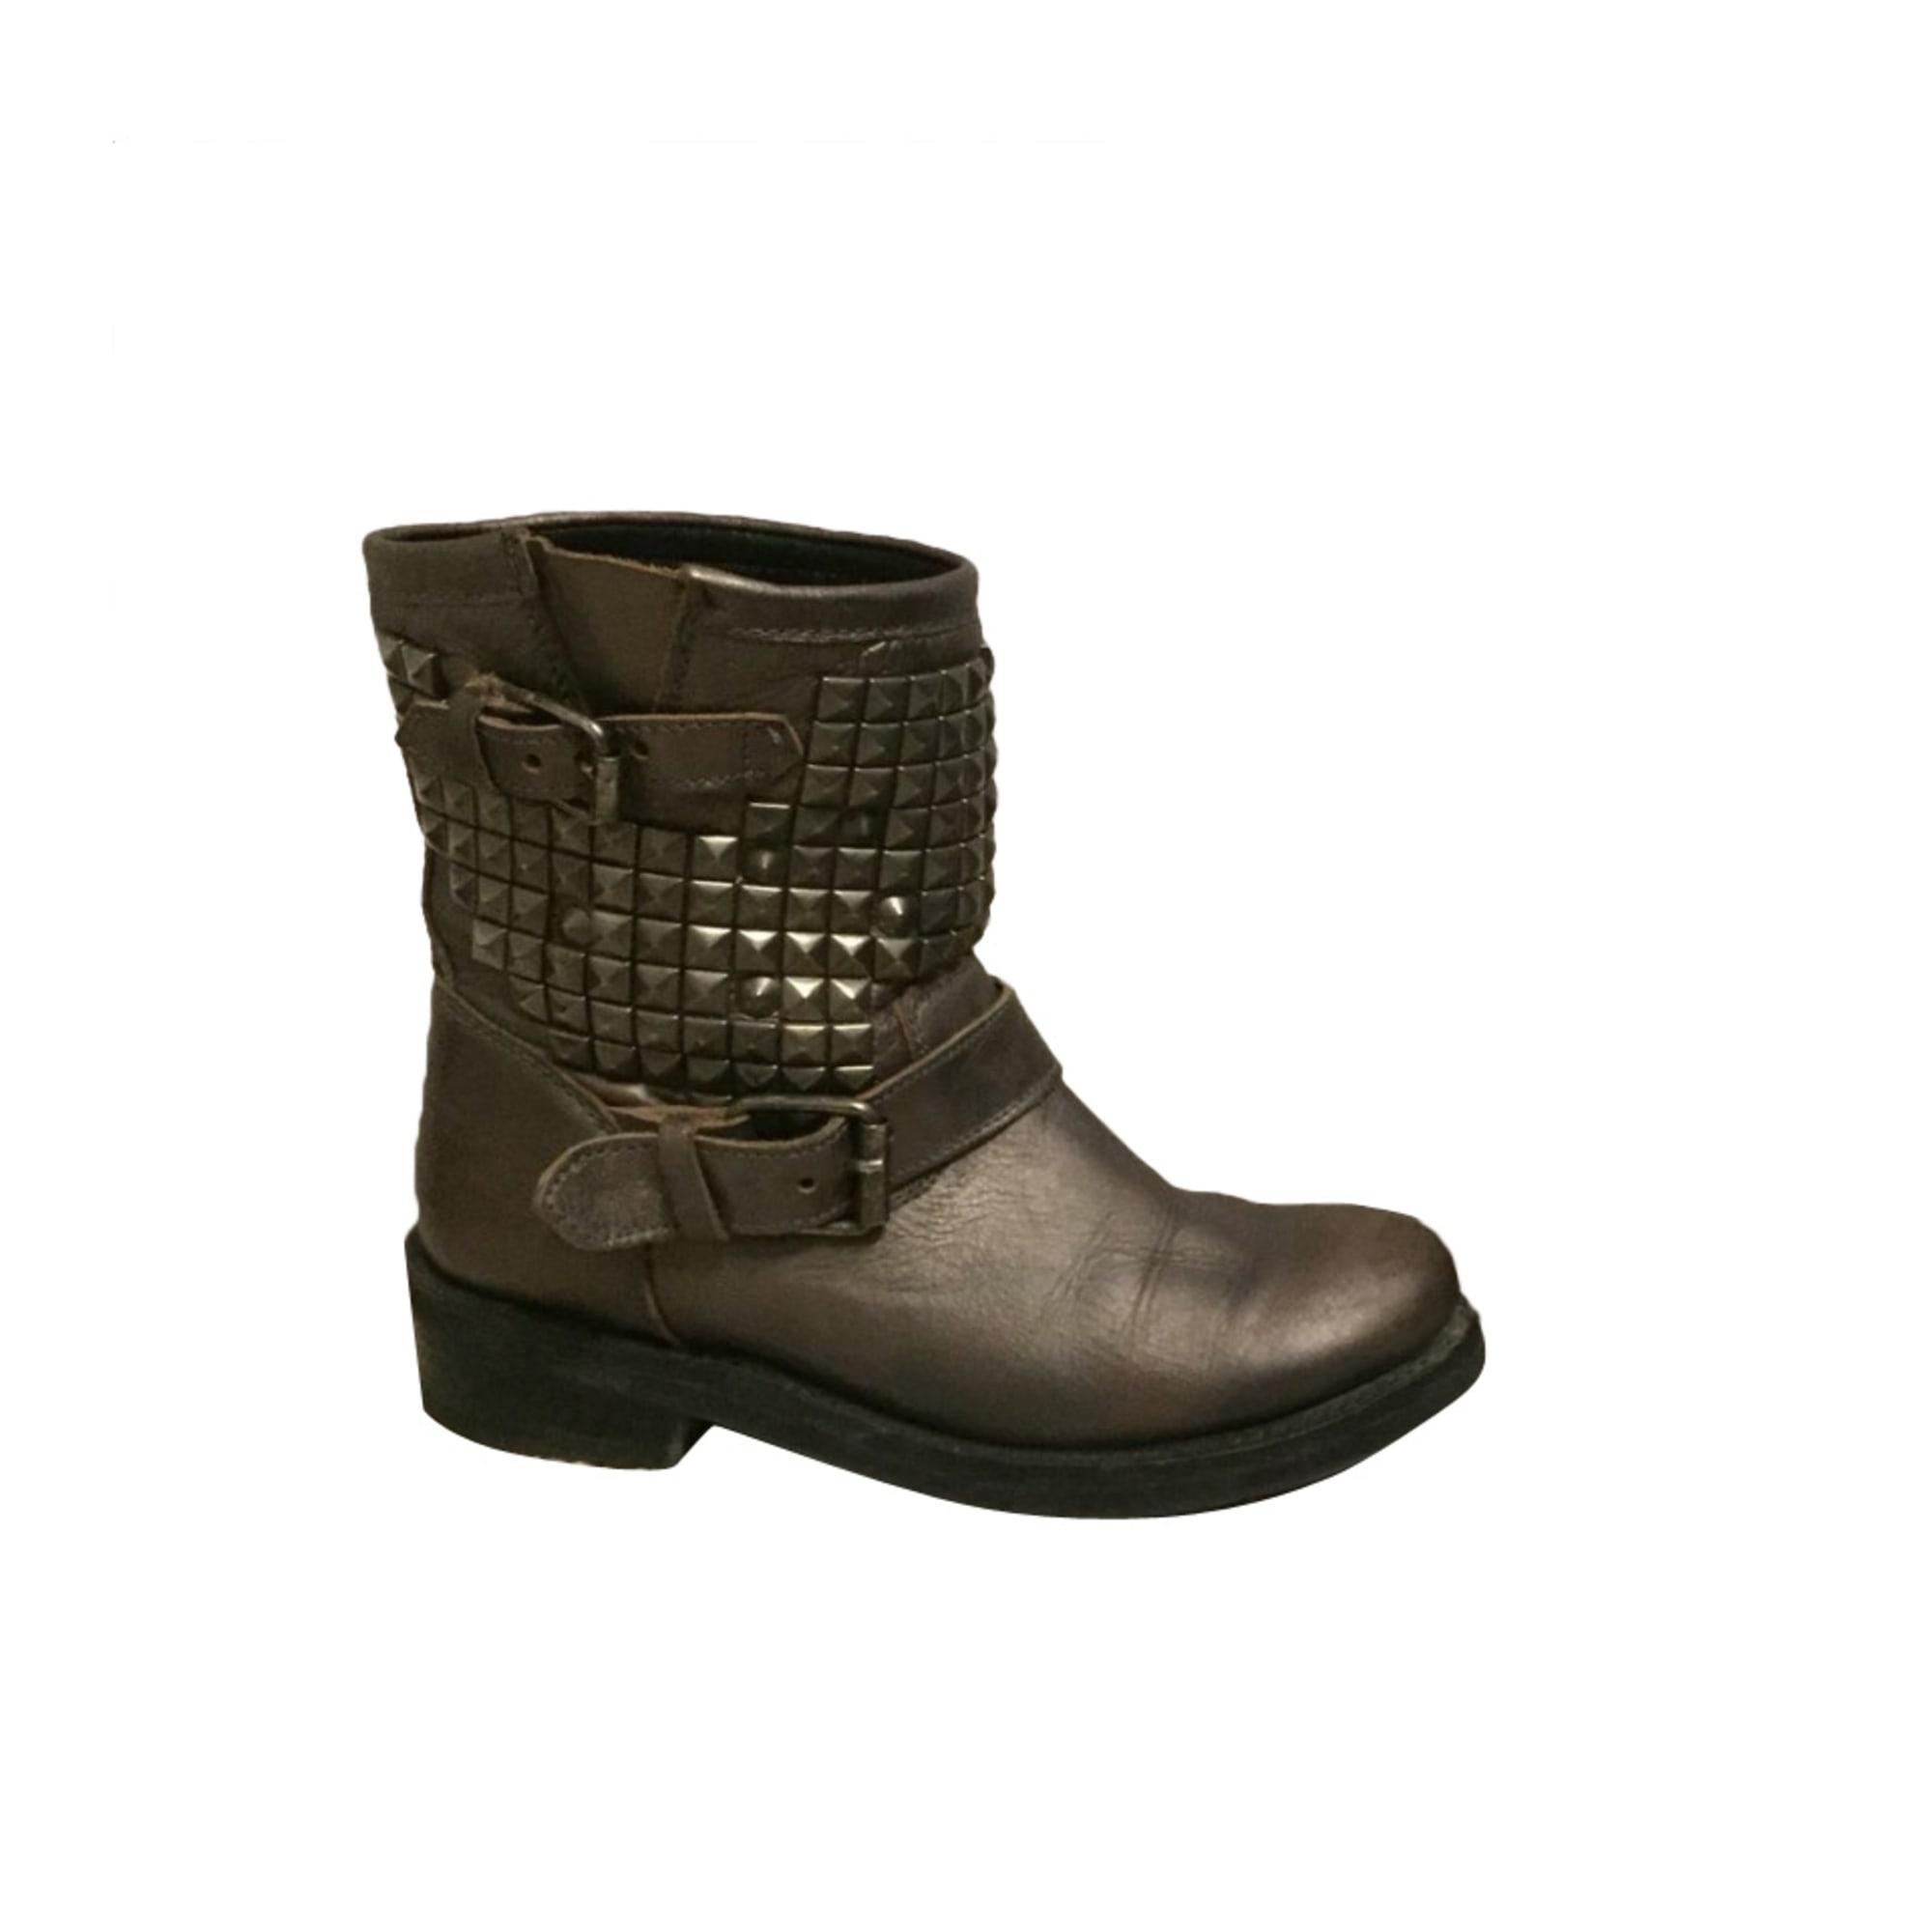 Bottines & low boots motards ASH cuir doré 38 3JXGKi